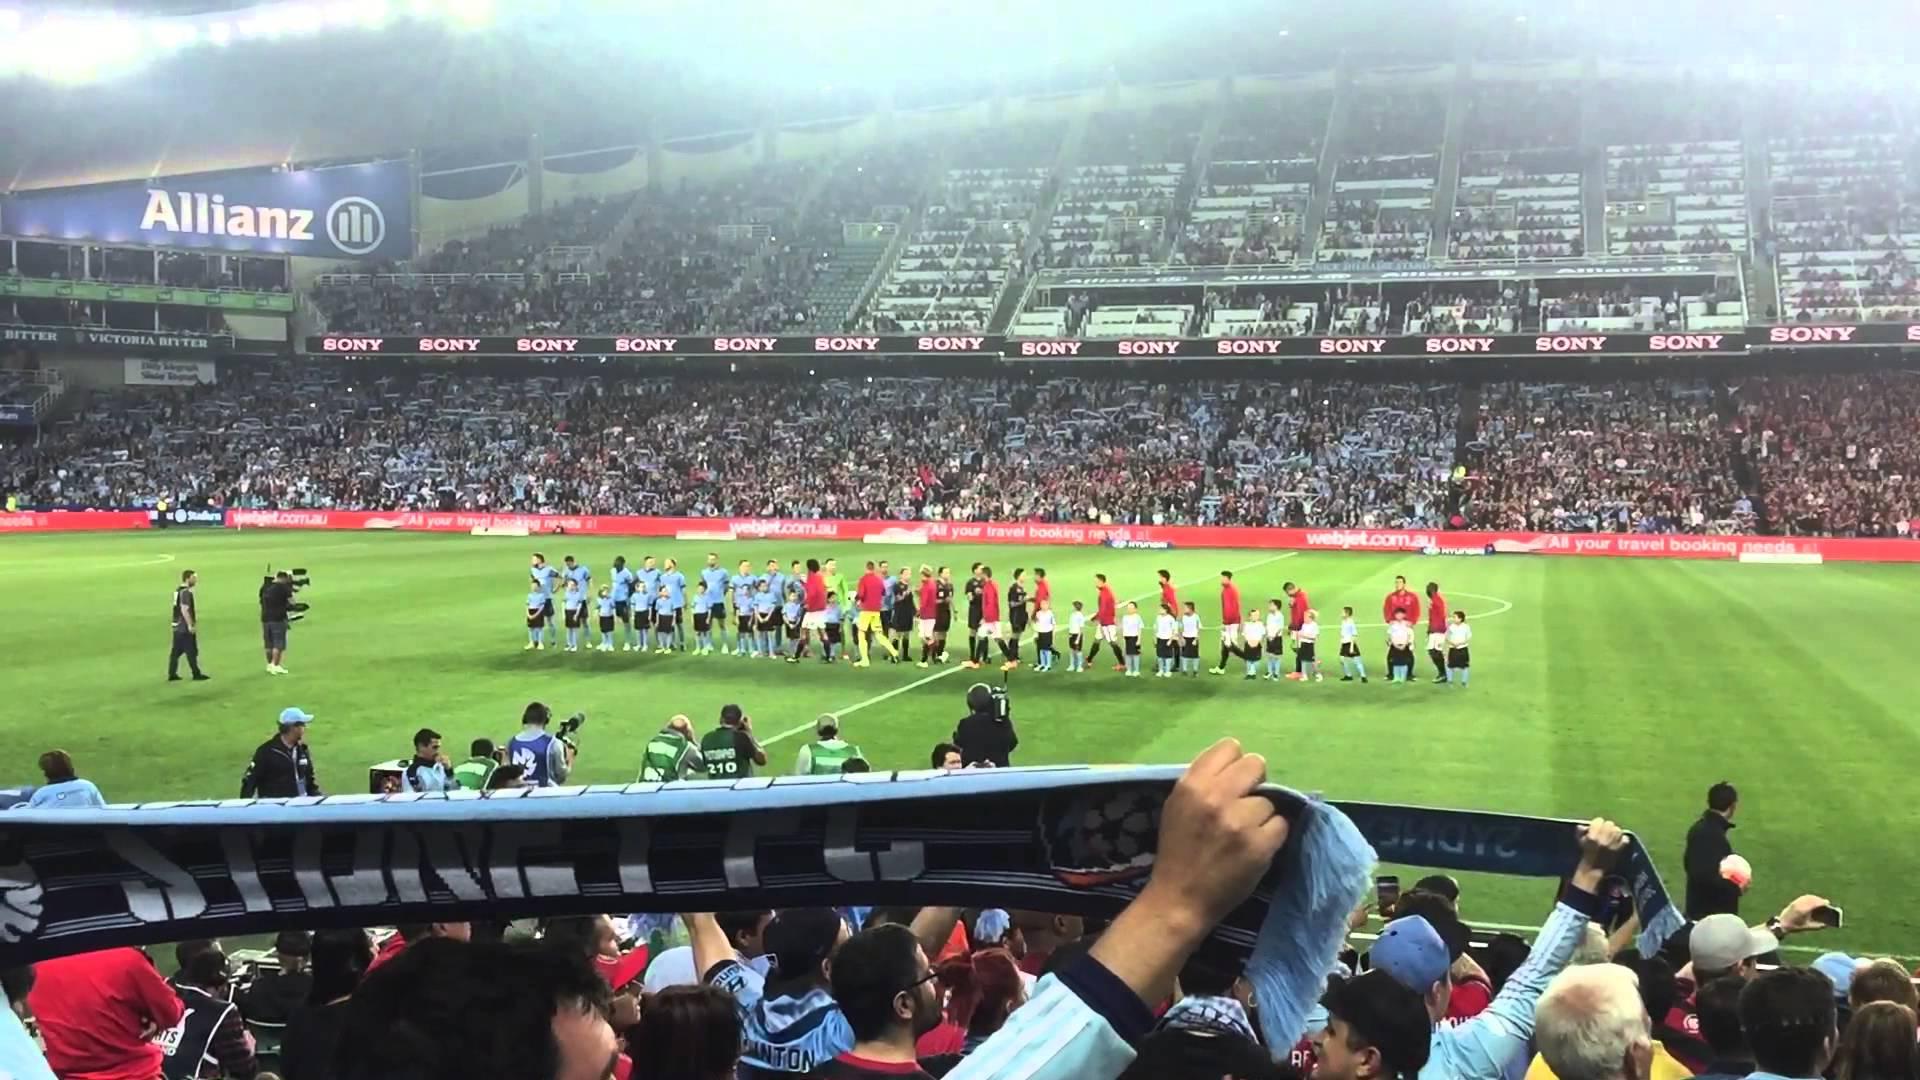 sydney fc - Sydney Football StadiumCapacity: 44000